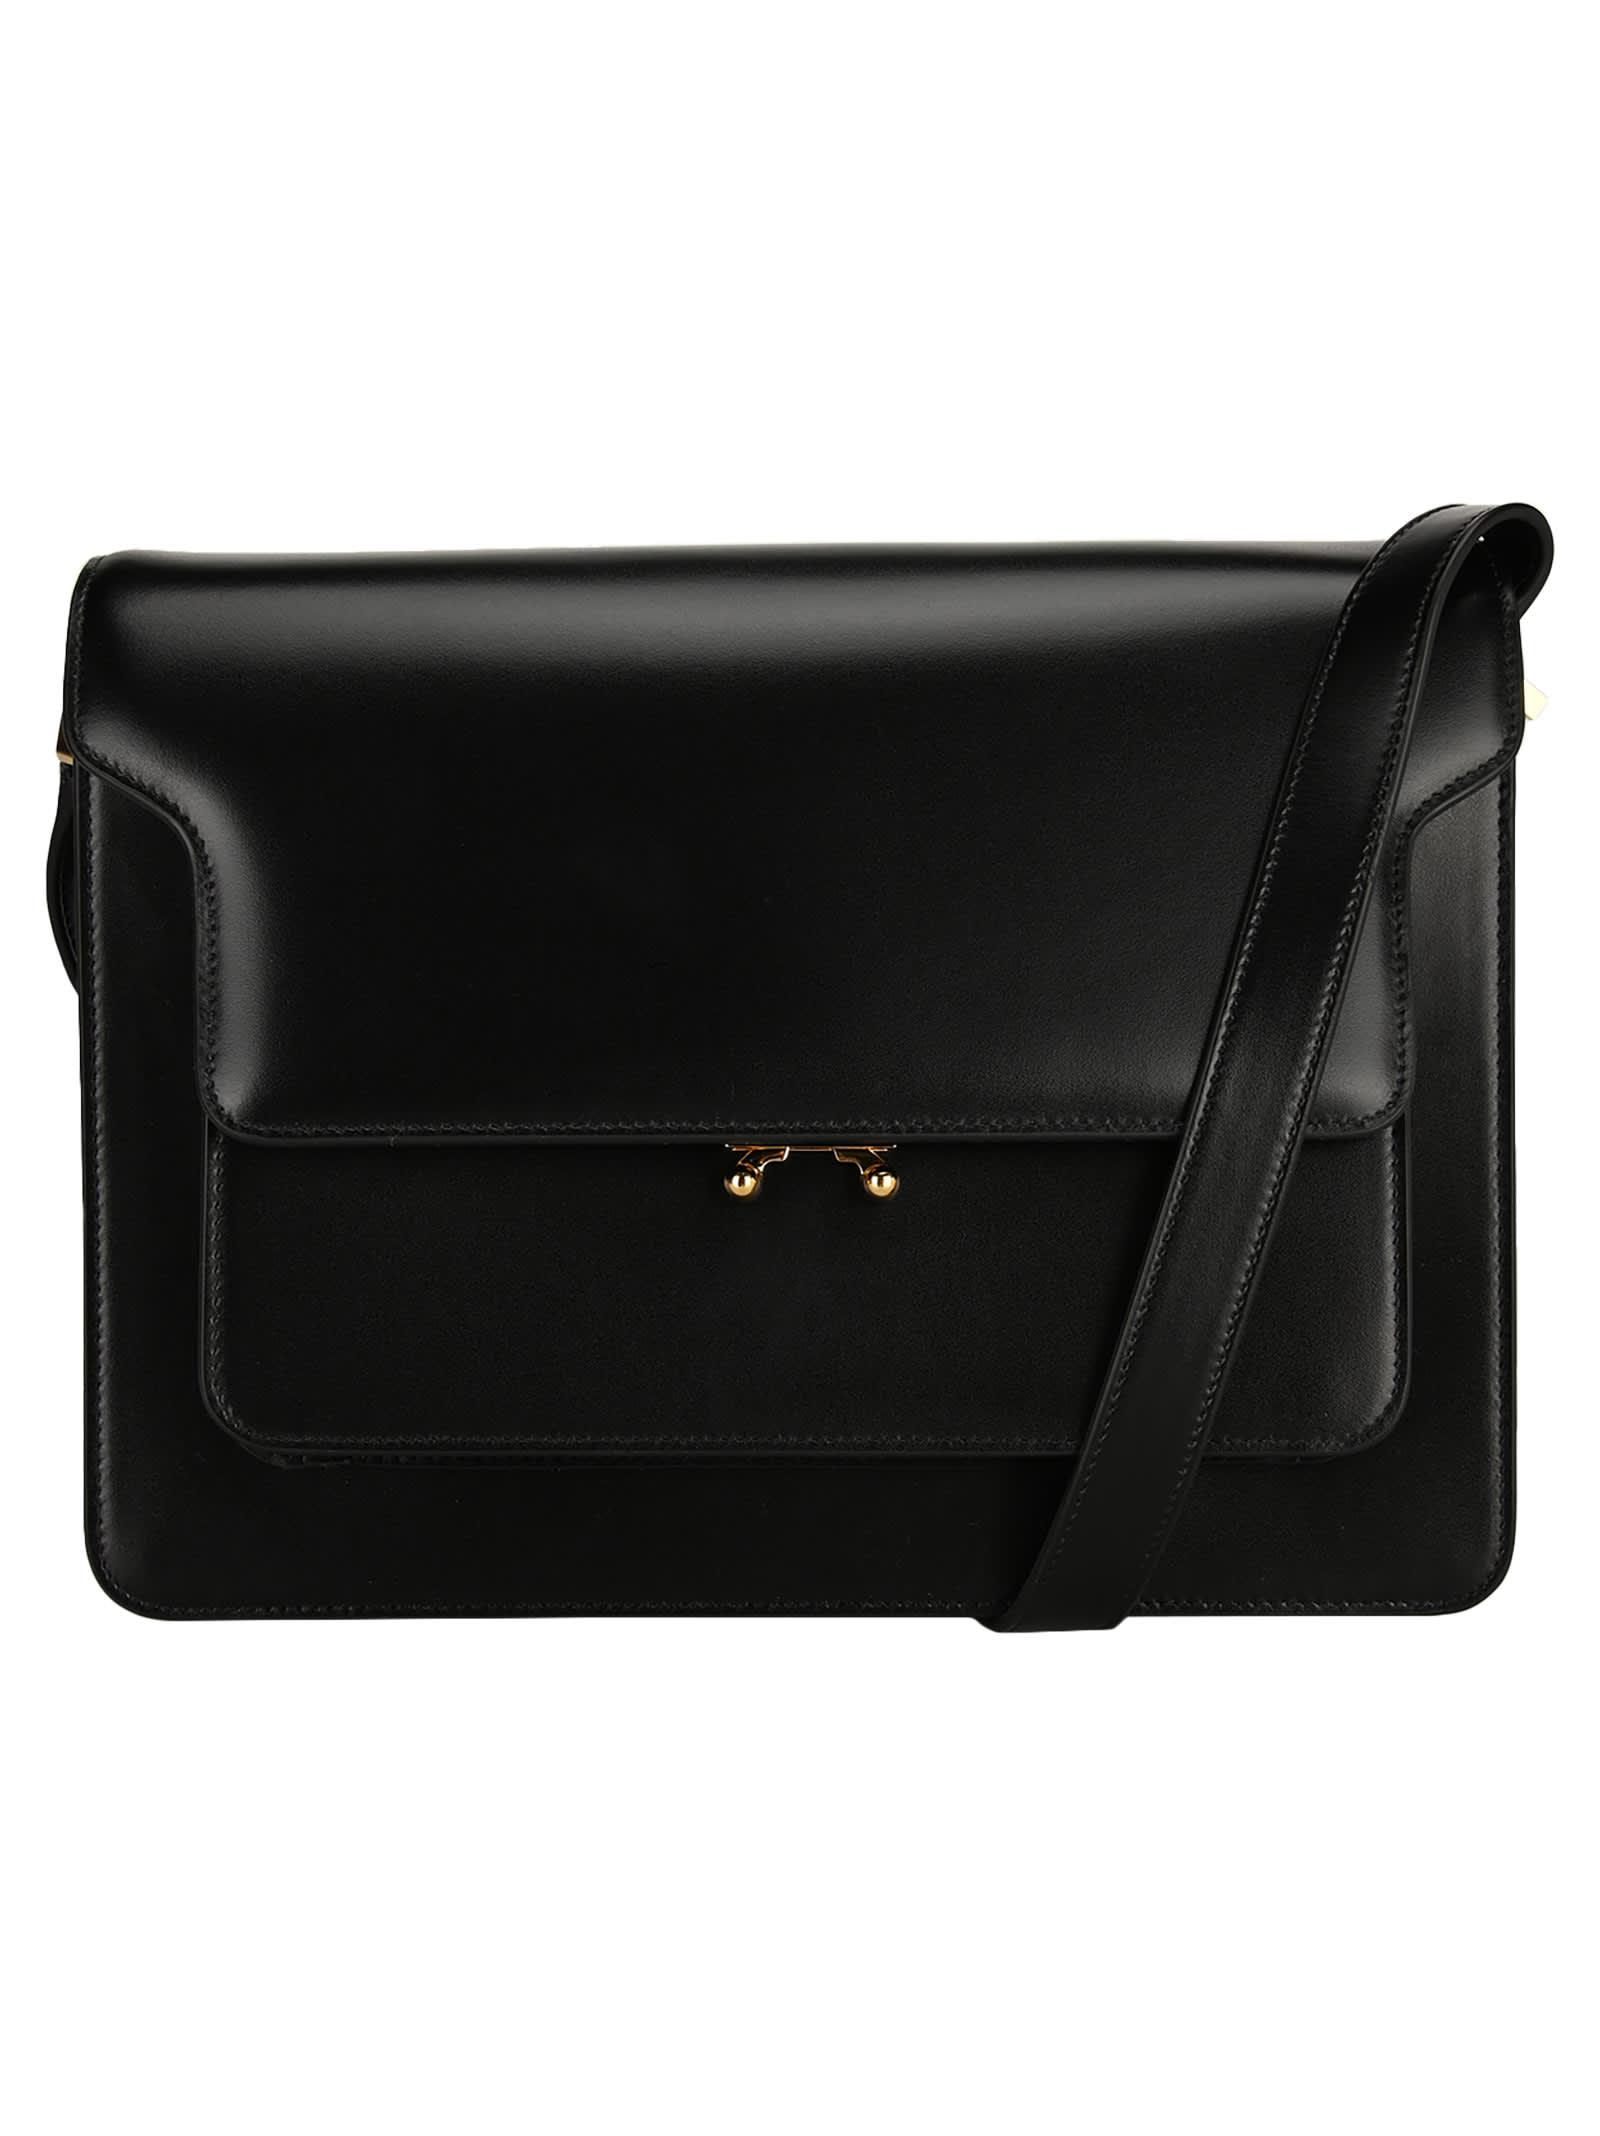 Marni Trunck Compact Bag